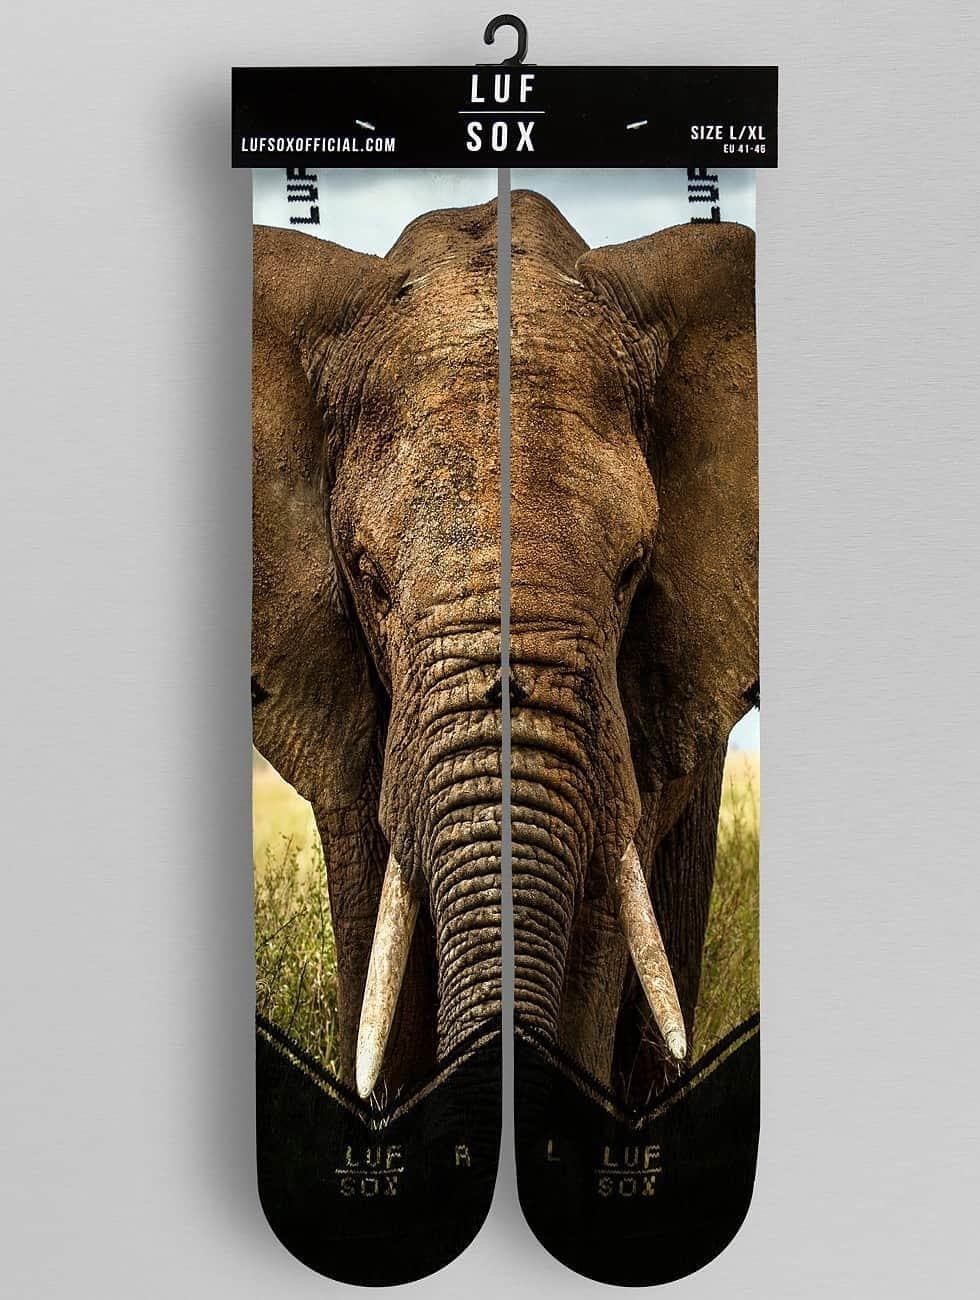 LUF SOX Socken Elephant bunt